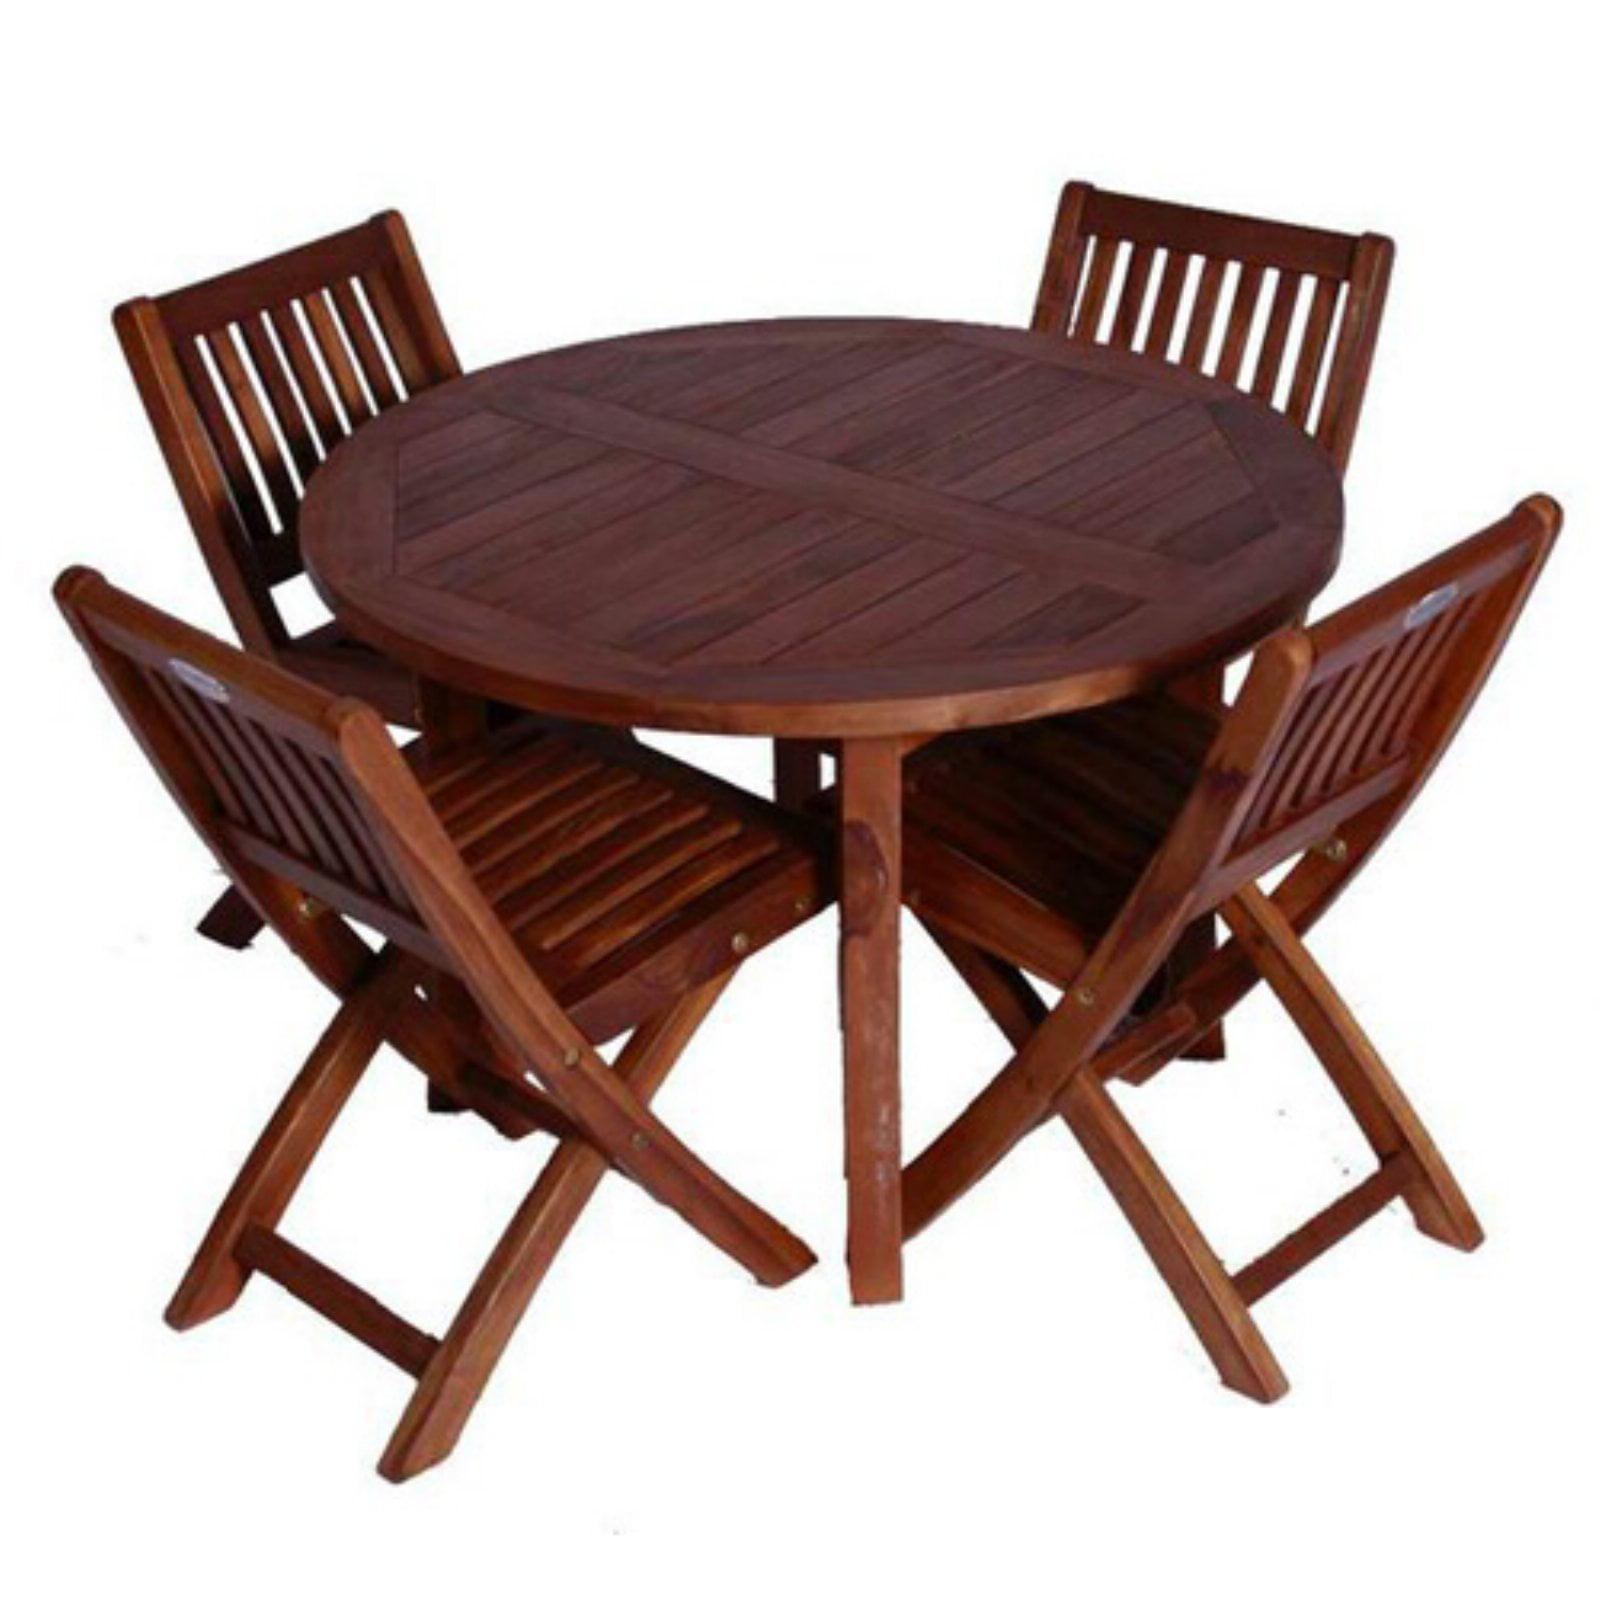 JazTy Kids Round Table & Chair Set - Seats 4